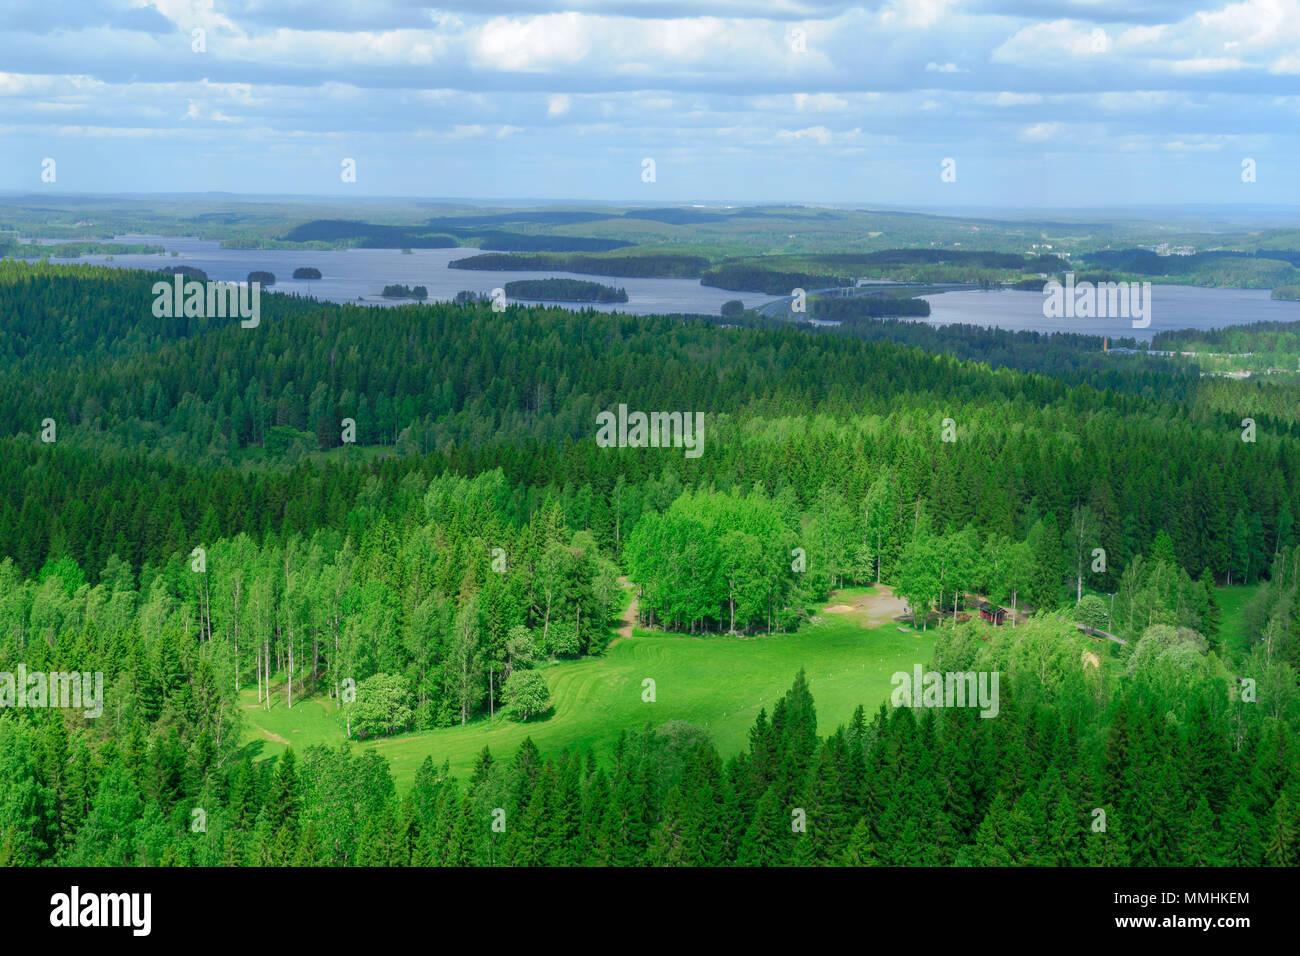 Landscape of Lake Kallavesi and Kuopio region, Finland - Stock Image